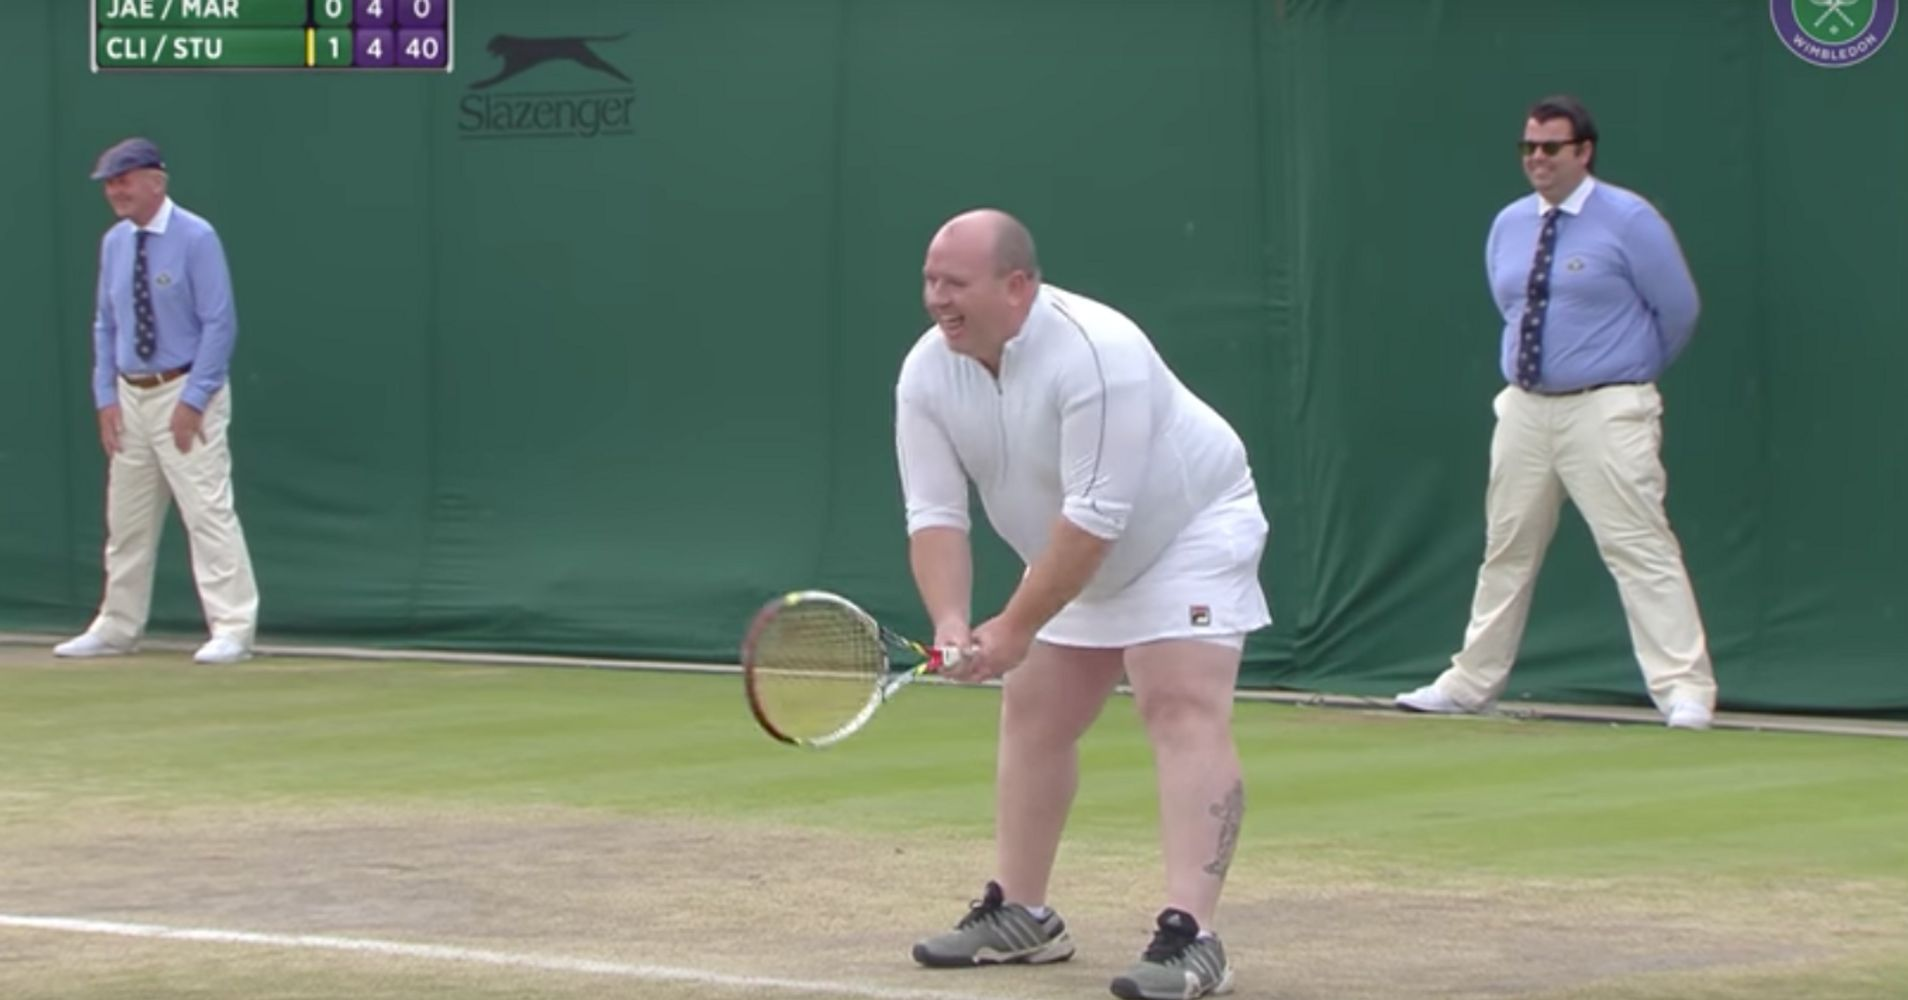 Male Tennis Fan Dons Skirt To Play Wimbledon Women After Shouting Advice   Huffpost